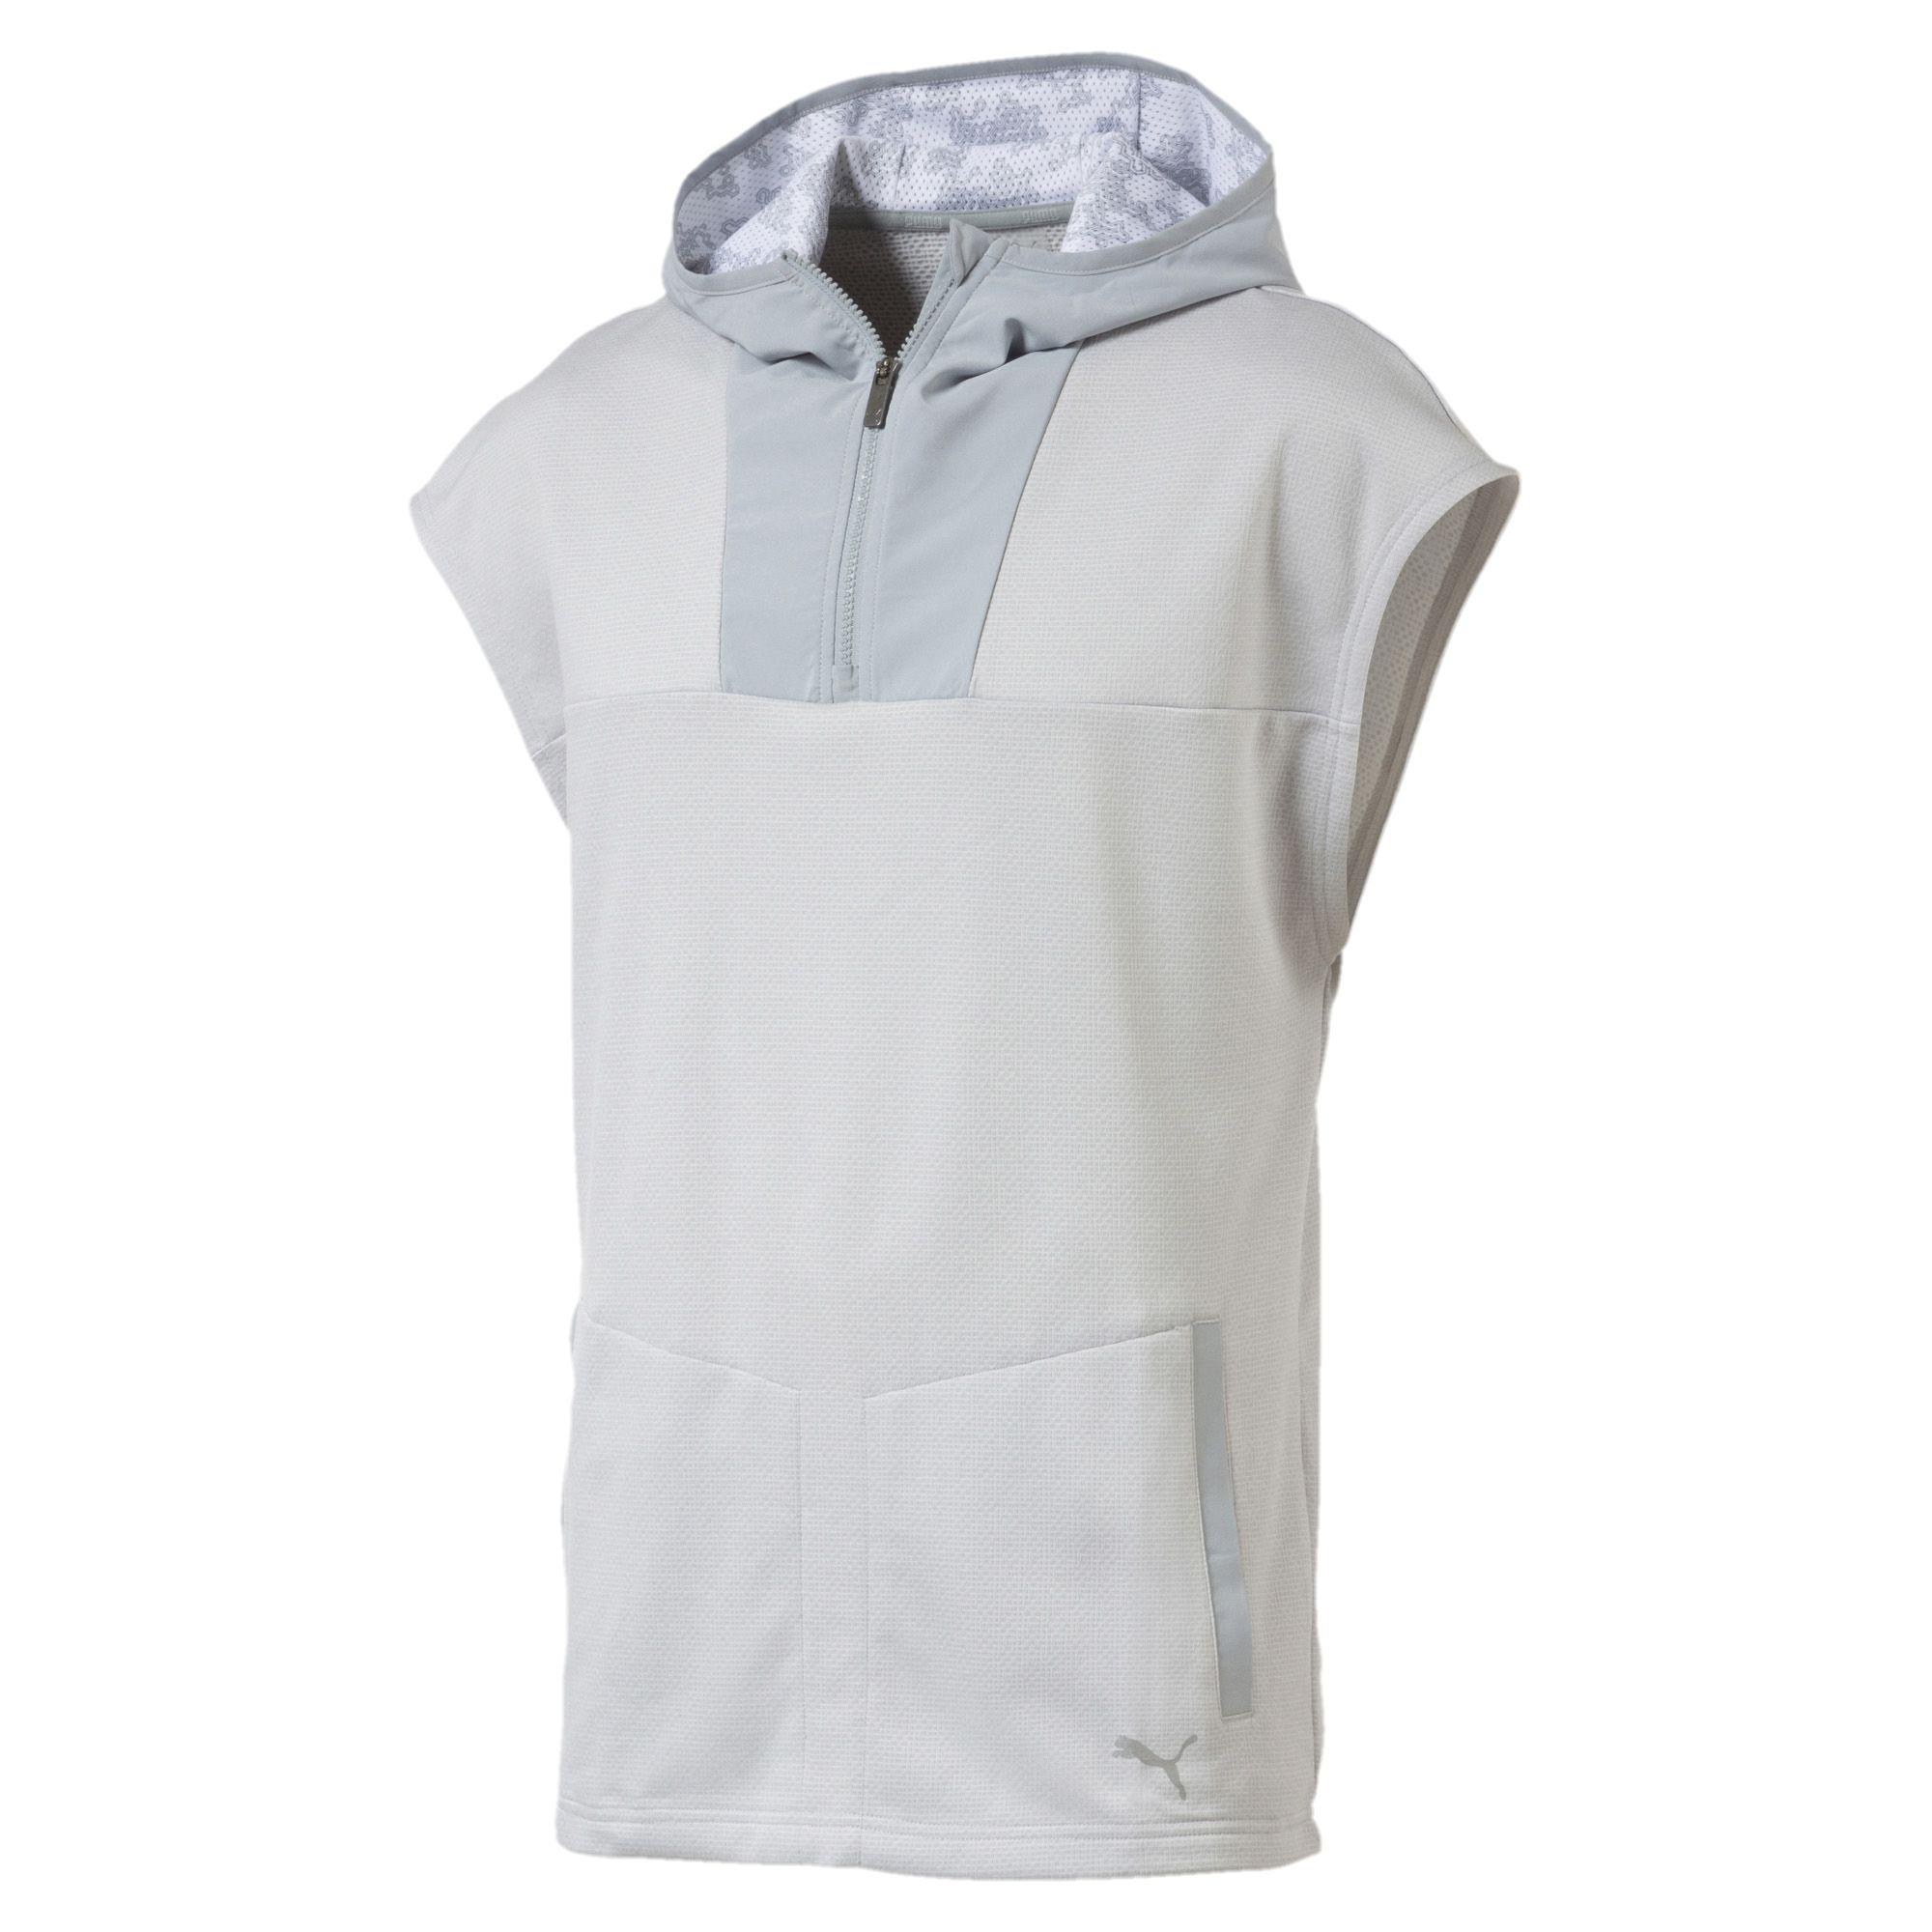 7fba231bb03c Lyst - PUMA Oceanaire Men s Sleeveless Hoodie in Gray for Men